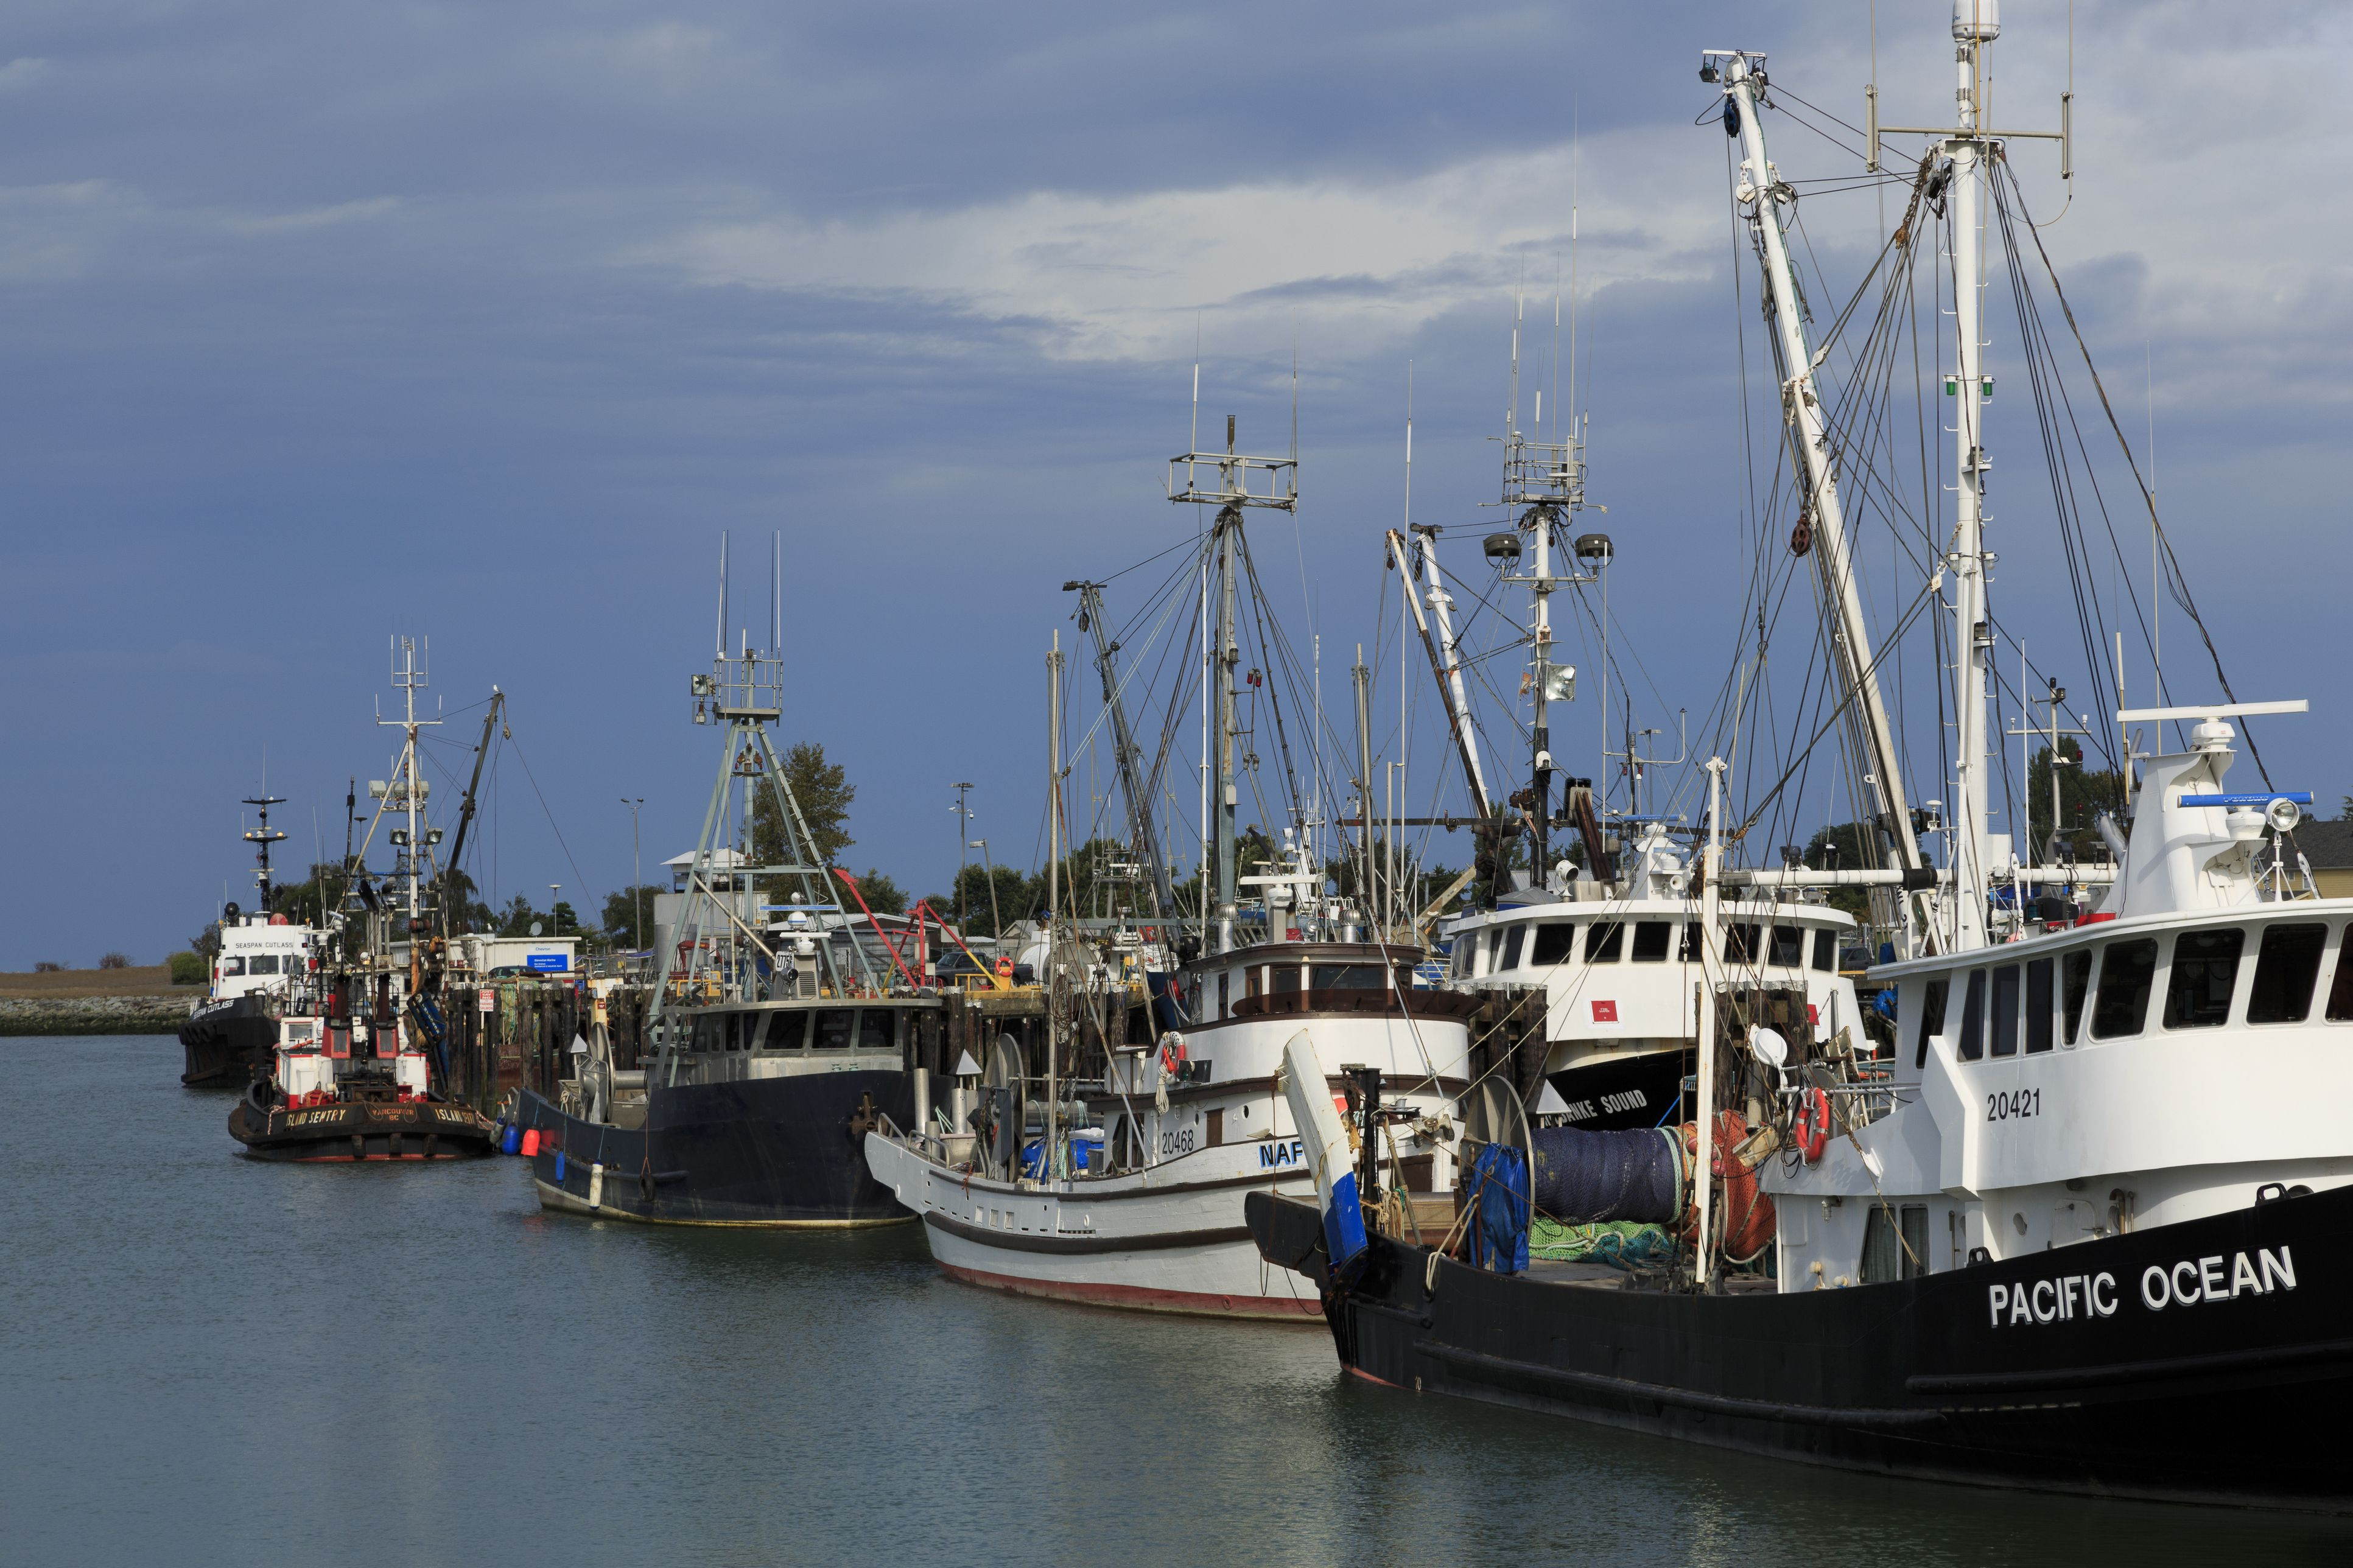 Steveston Fishing Village, Vancouver, British Columbia, Canada